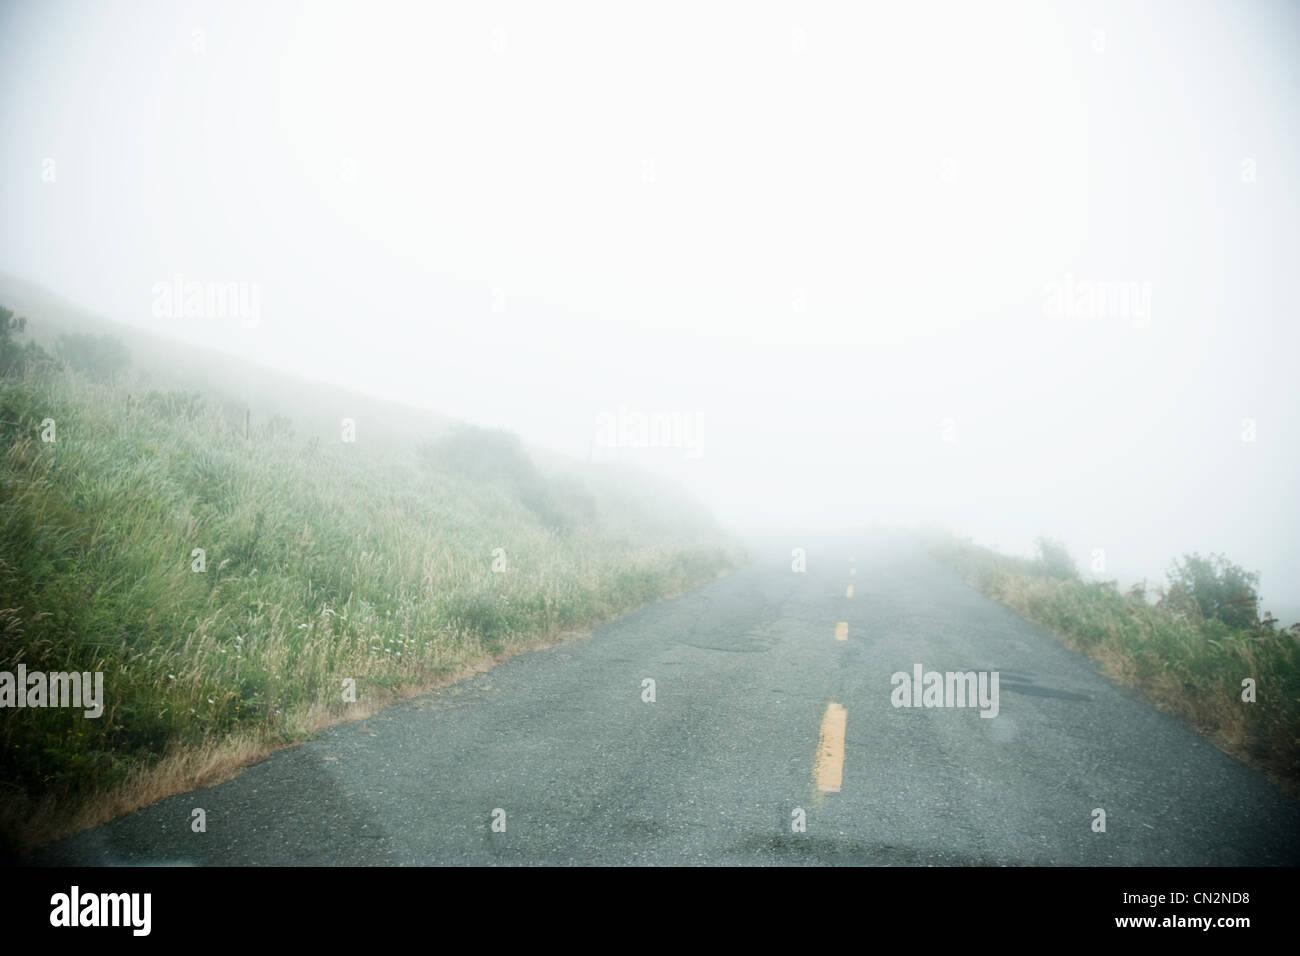 Foggy road through car windscreen - Stock Image